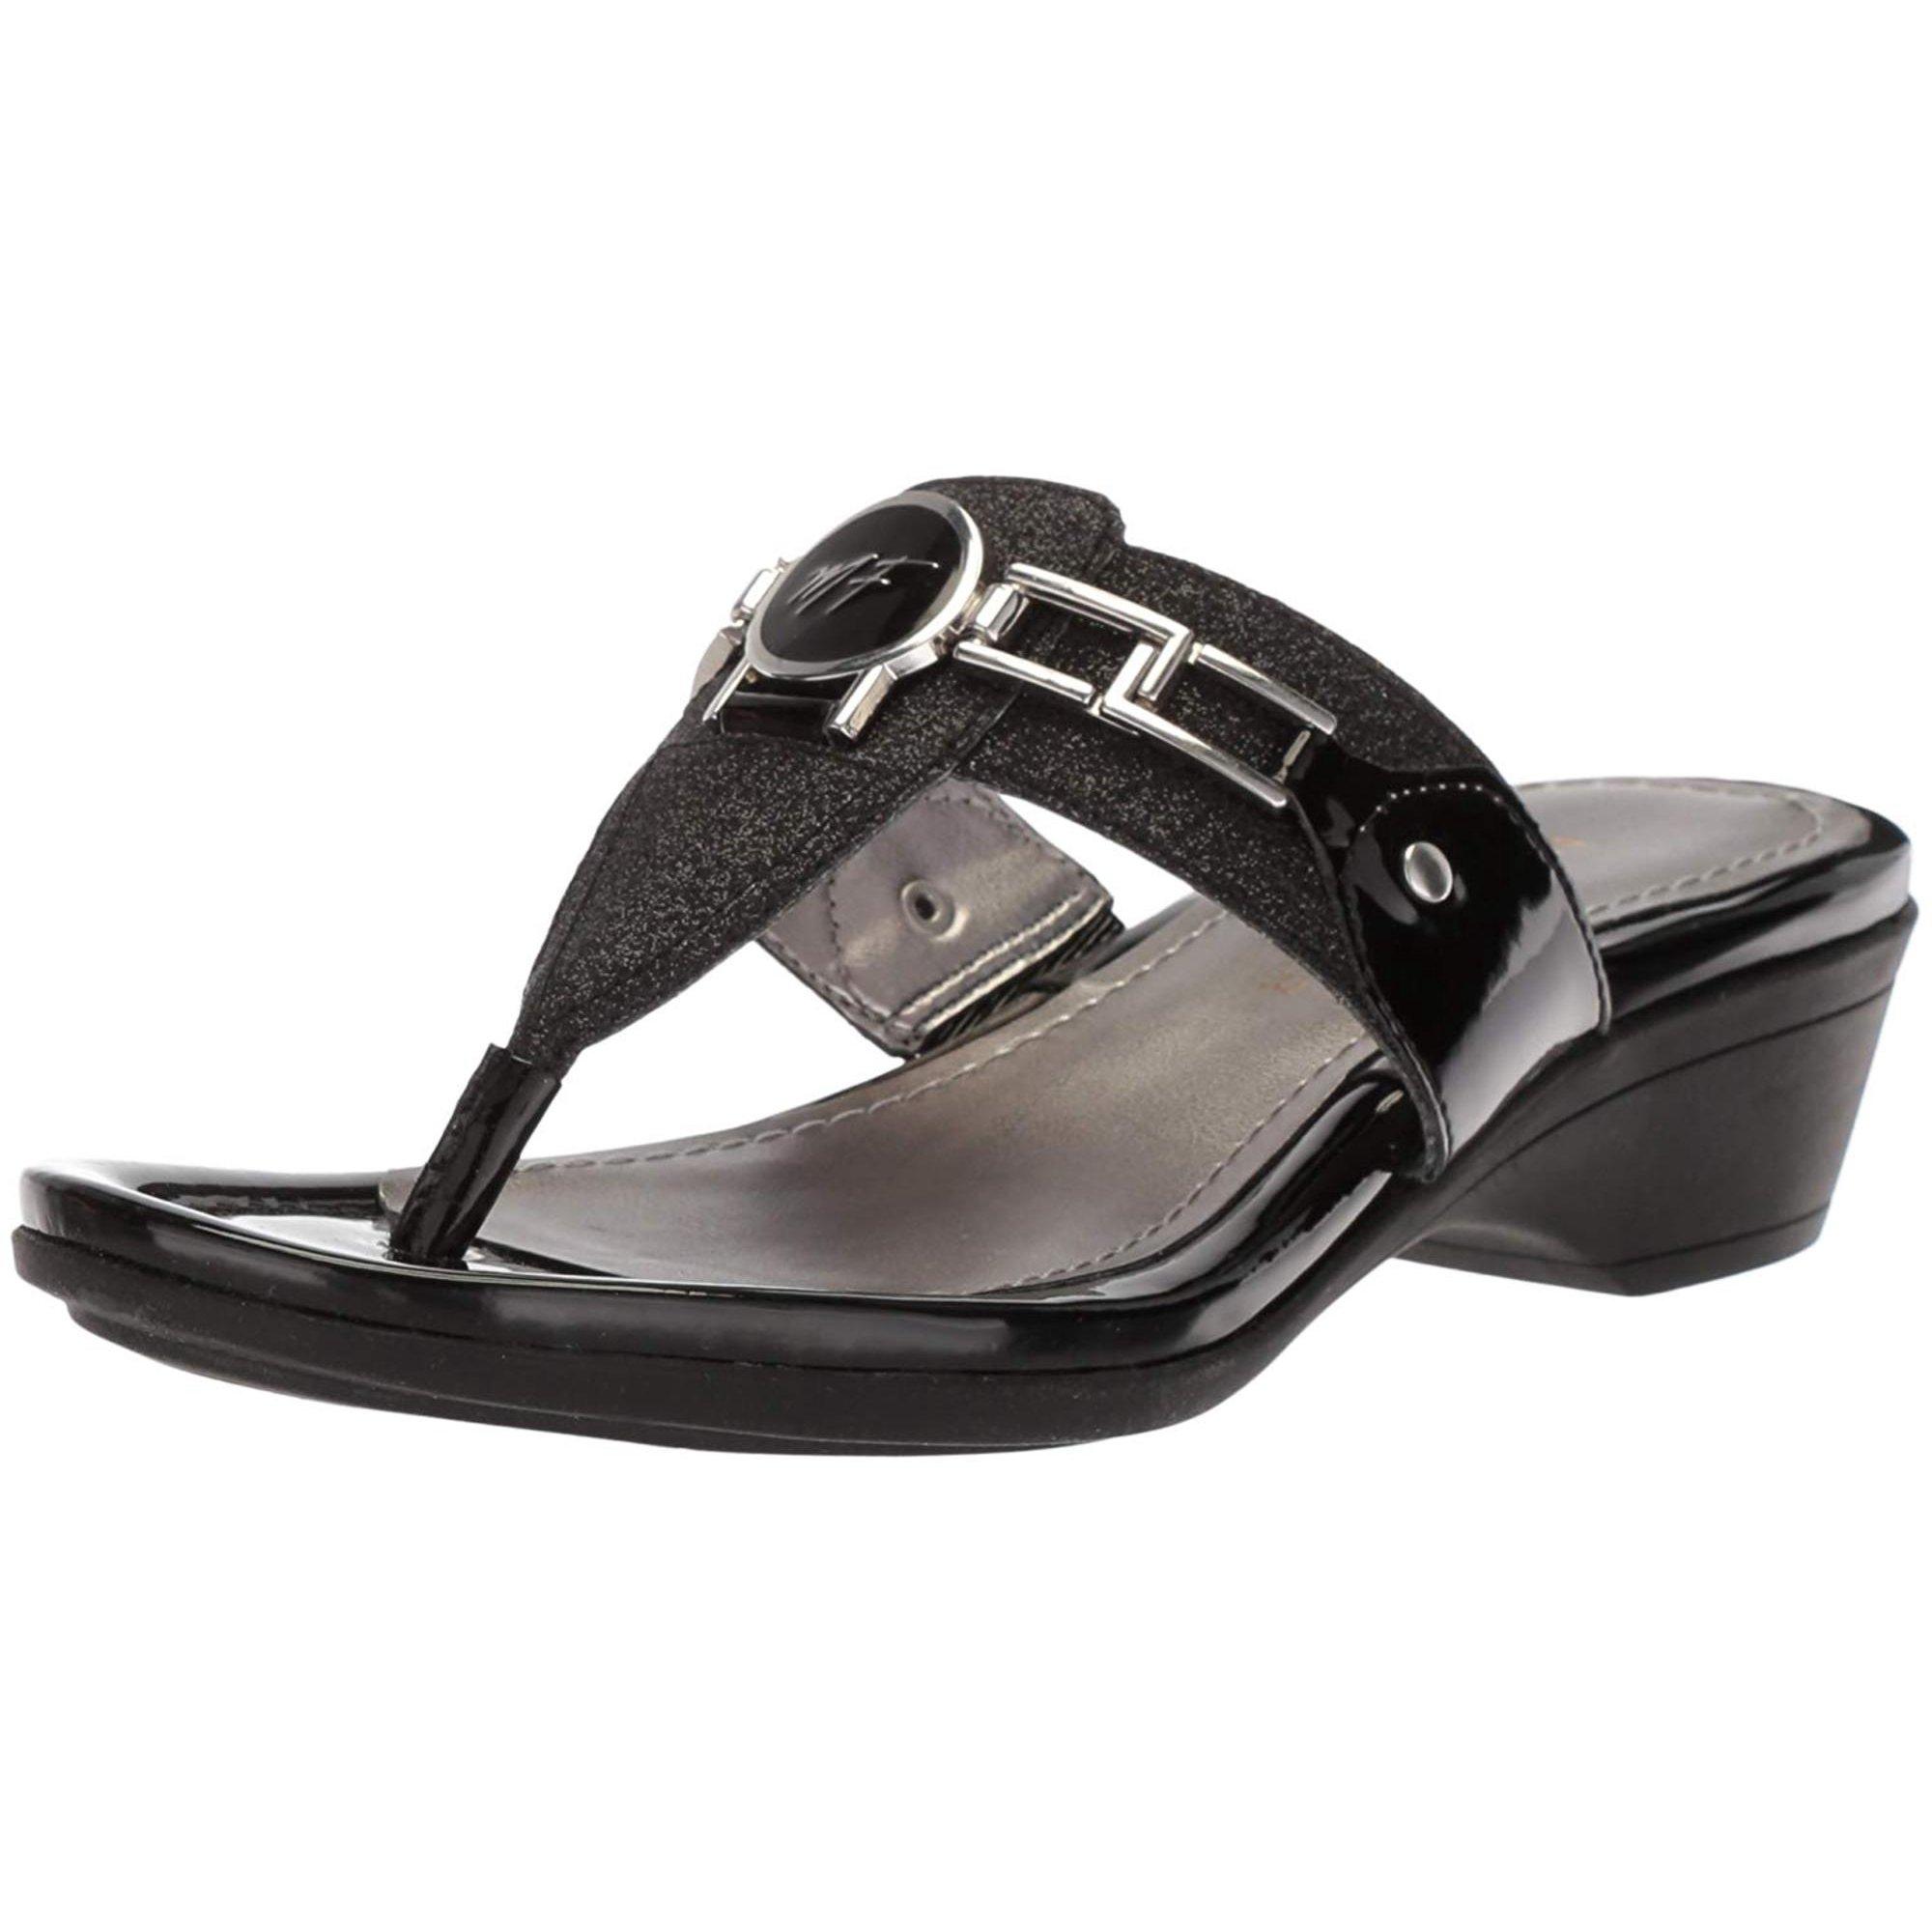 334bbce2ade2 Marc Fisher Womens Amina Split Toe Casual Slide Sandals